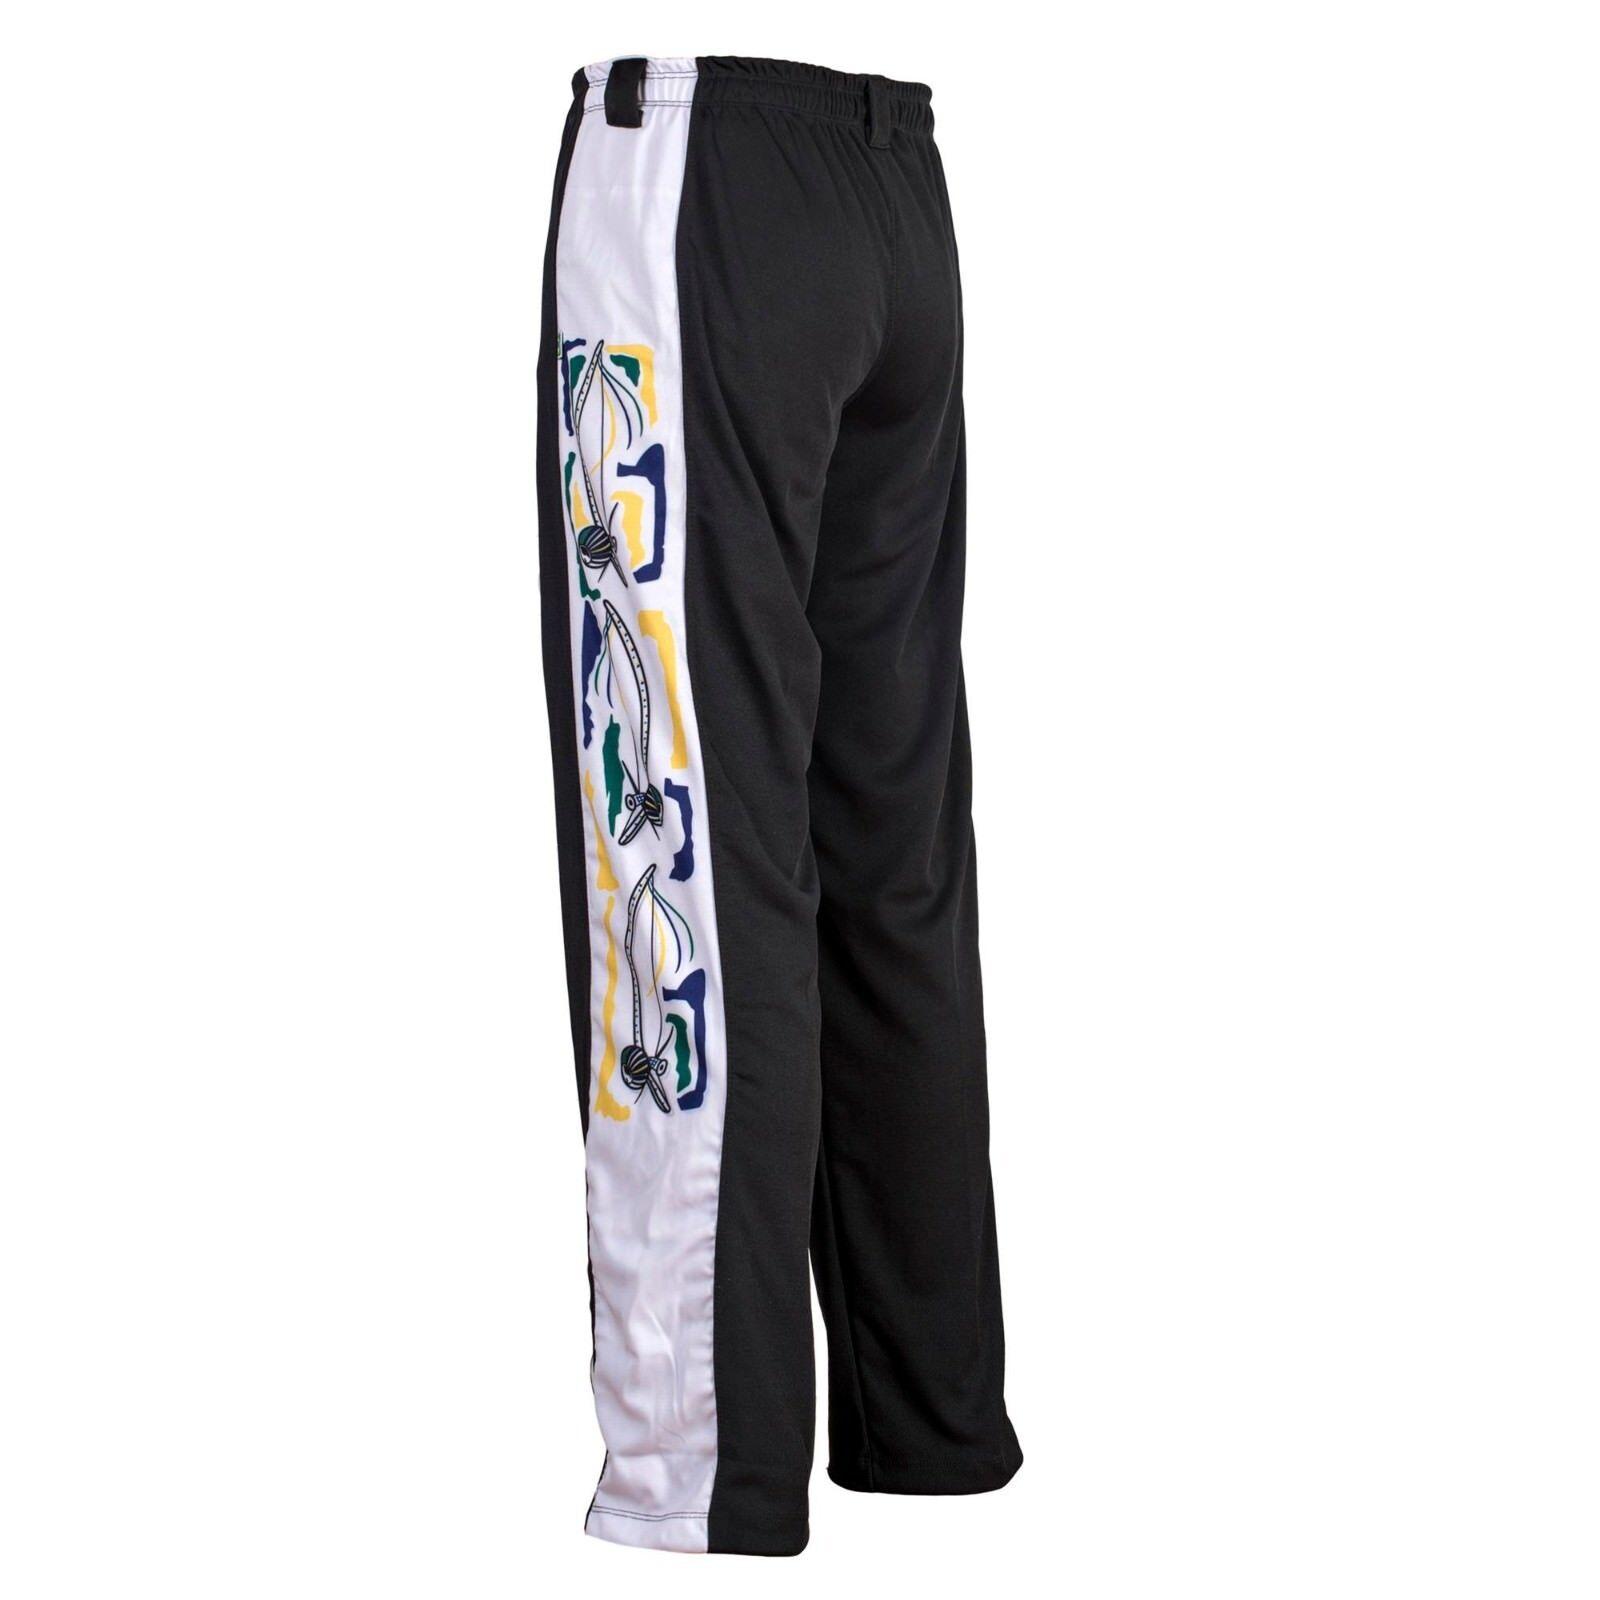 Schwarz Weiß Berimbau Brasilien Hosen Capoeira Capoeira Capoeira Abada Elastisch Kampfhosen 326eef